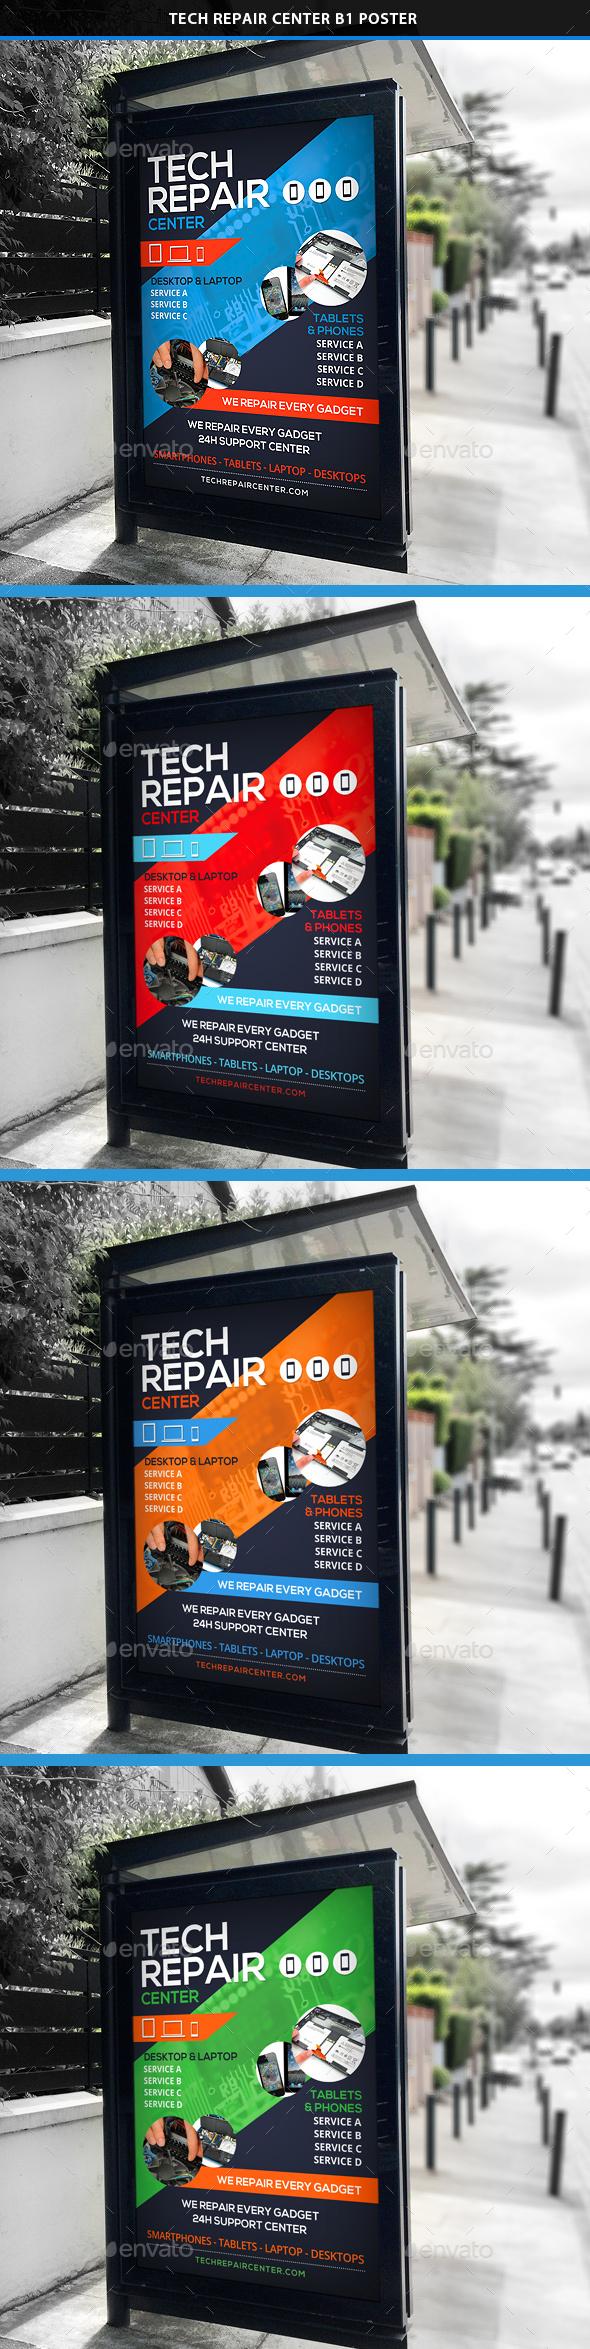 Tech Repair Center Signage B1 Poster - Signage Print Templates